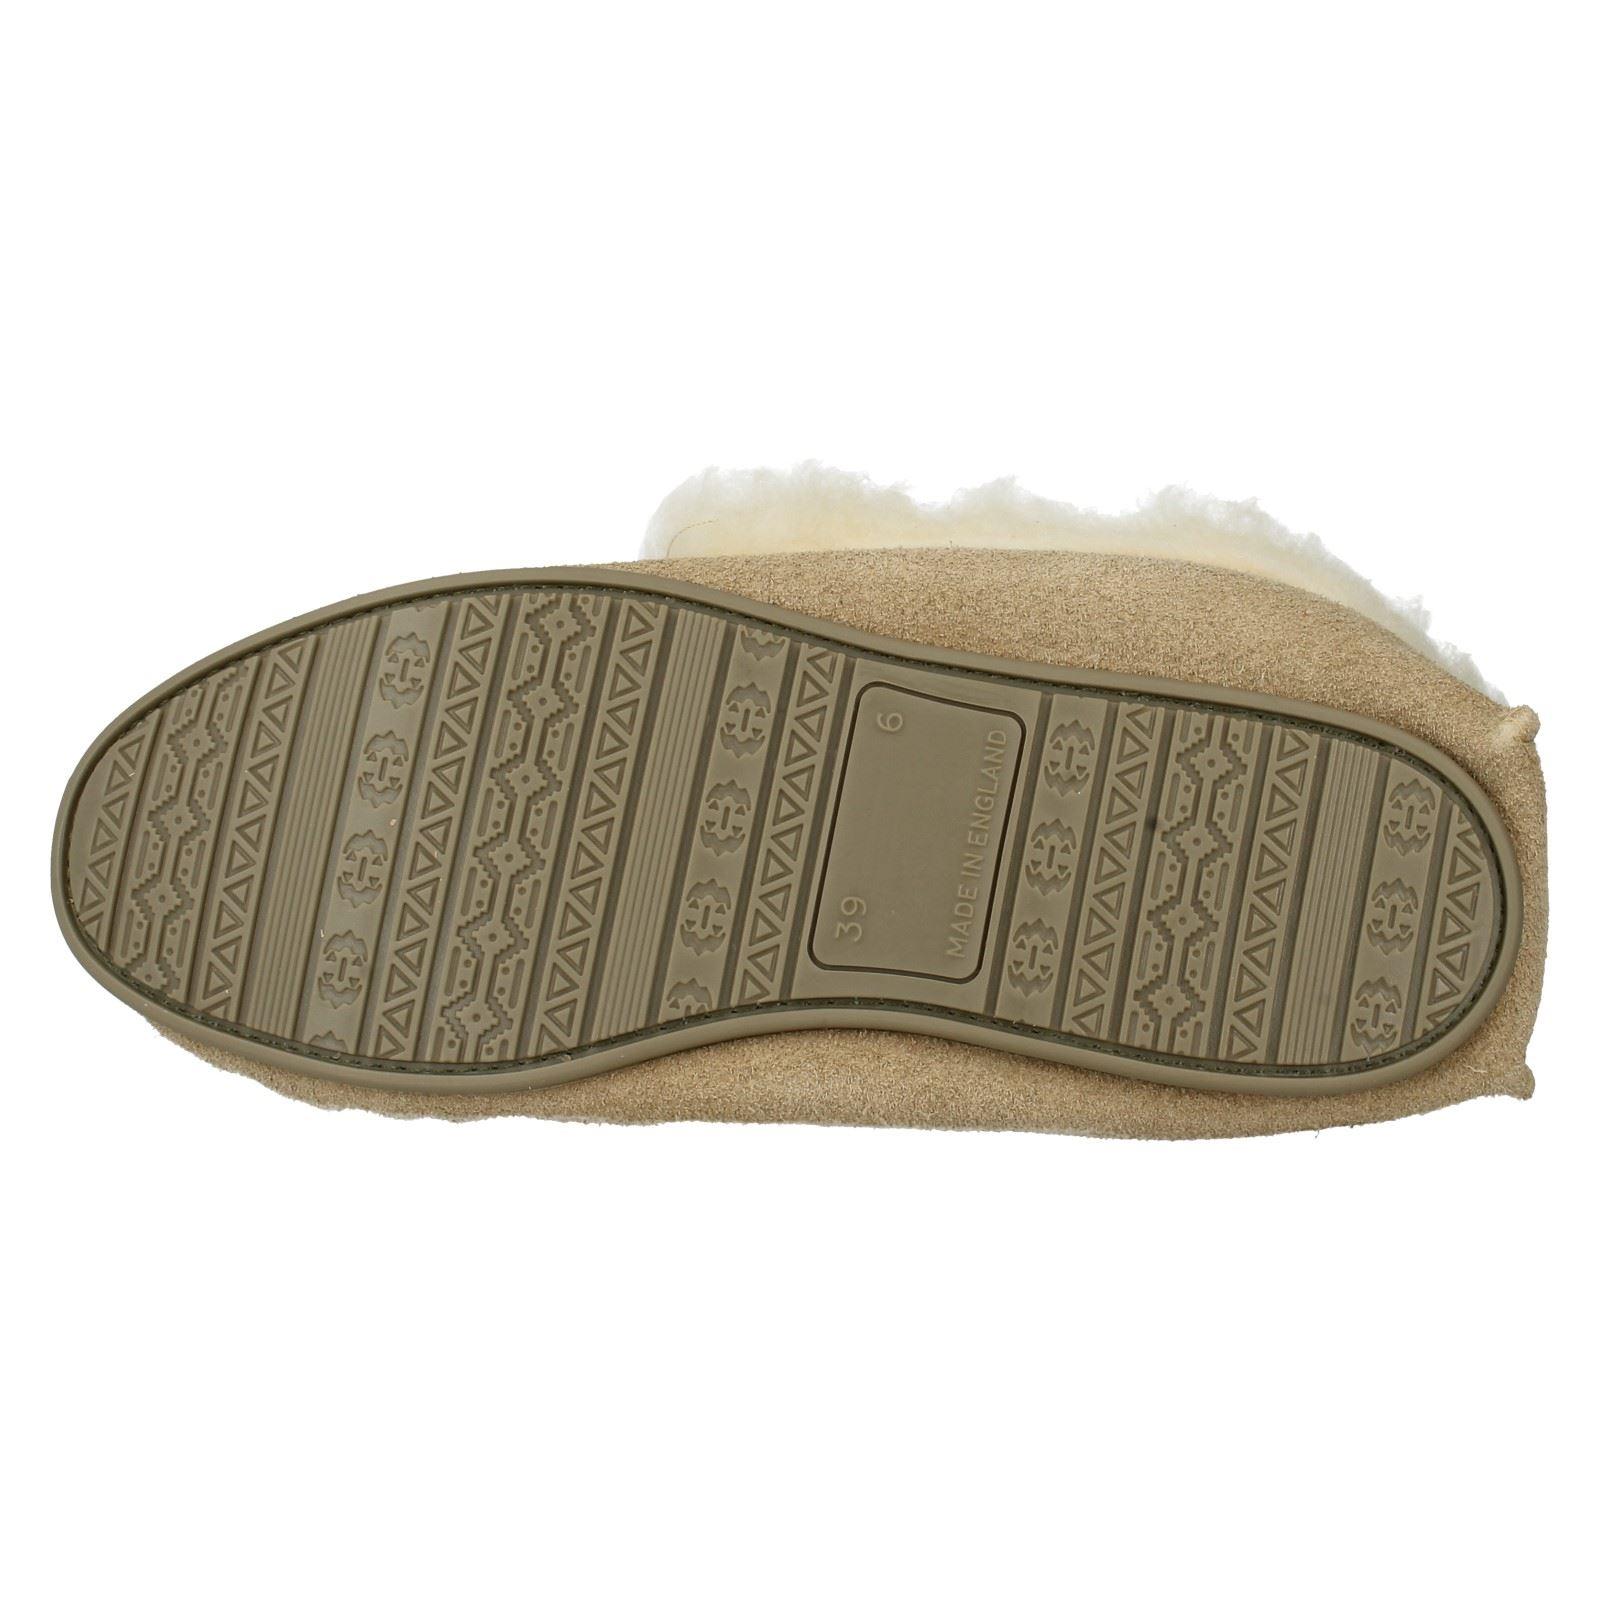 Damas Spot On Zapatillas Estilo Forrado De Piel Sintética-Real Gamuza Botas